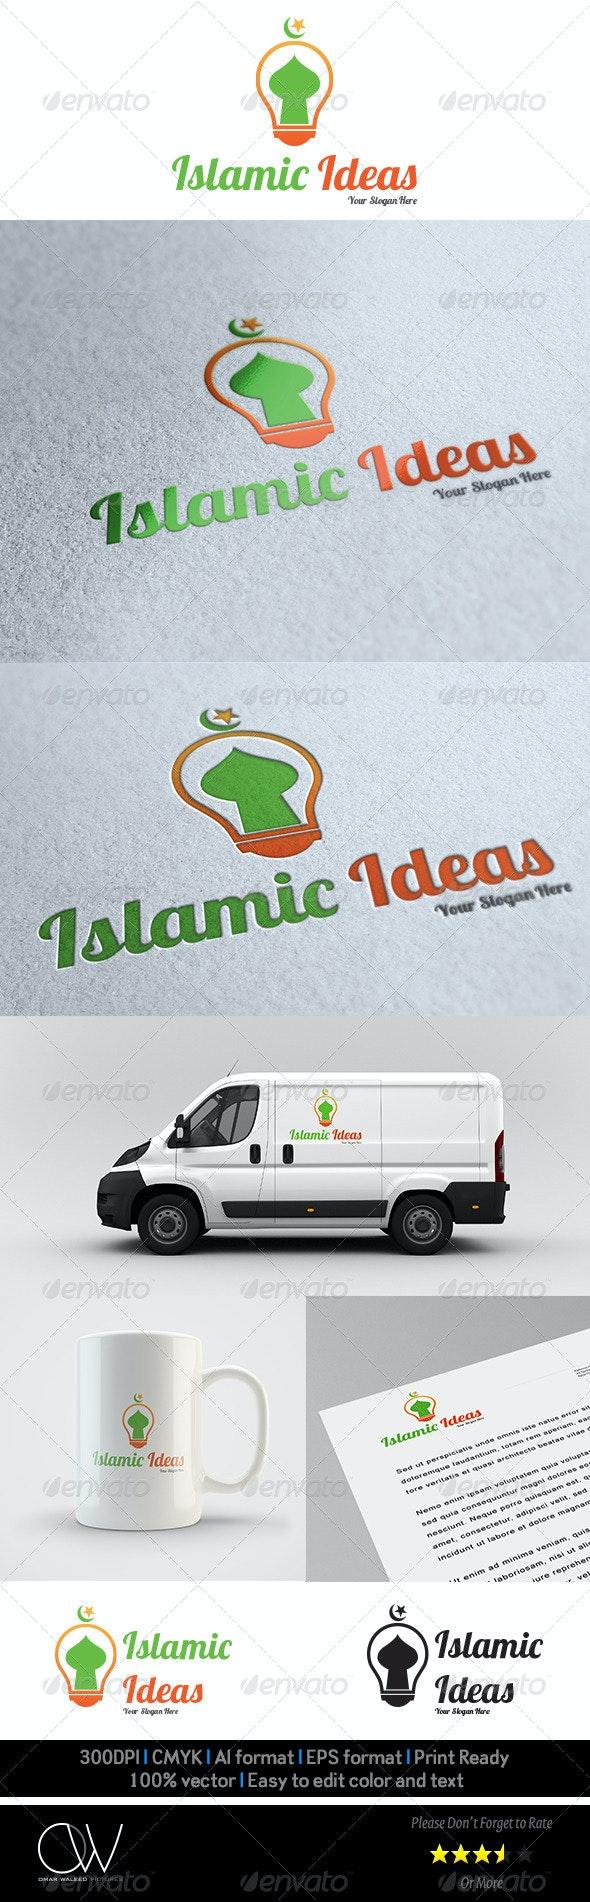 Islamic Ideas Logo Template - Vector Abstract